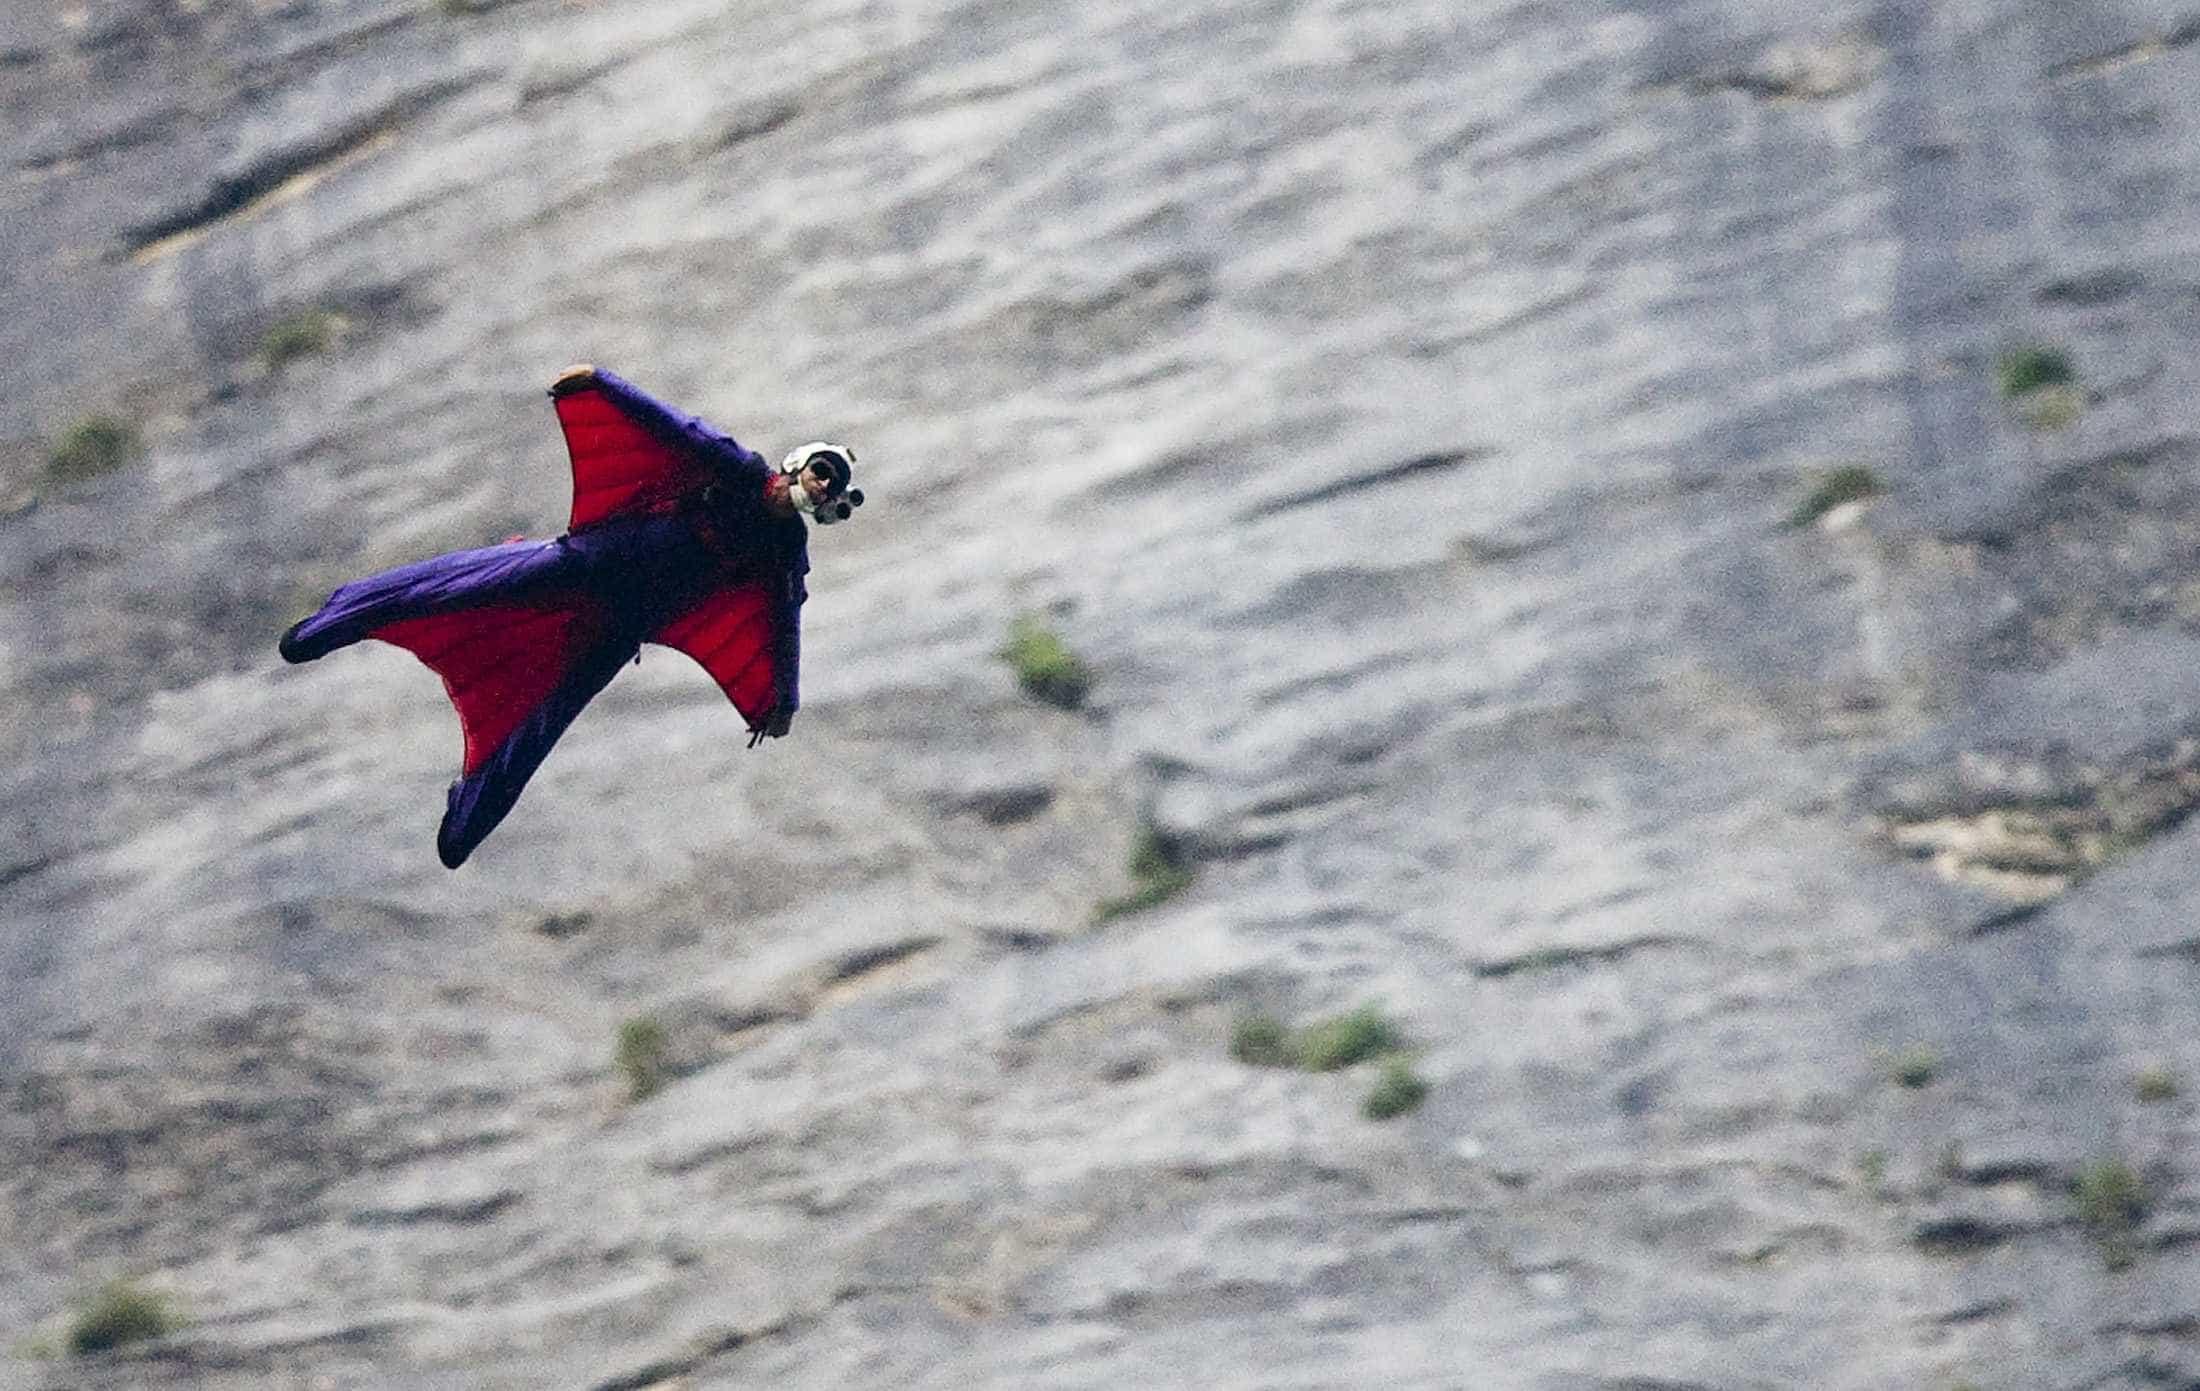 Base jumper brasileiro morre ao saltar de montanha na Itália